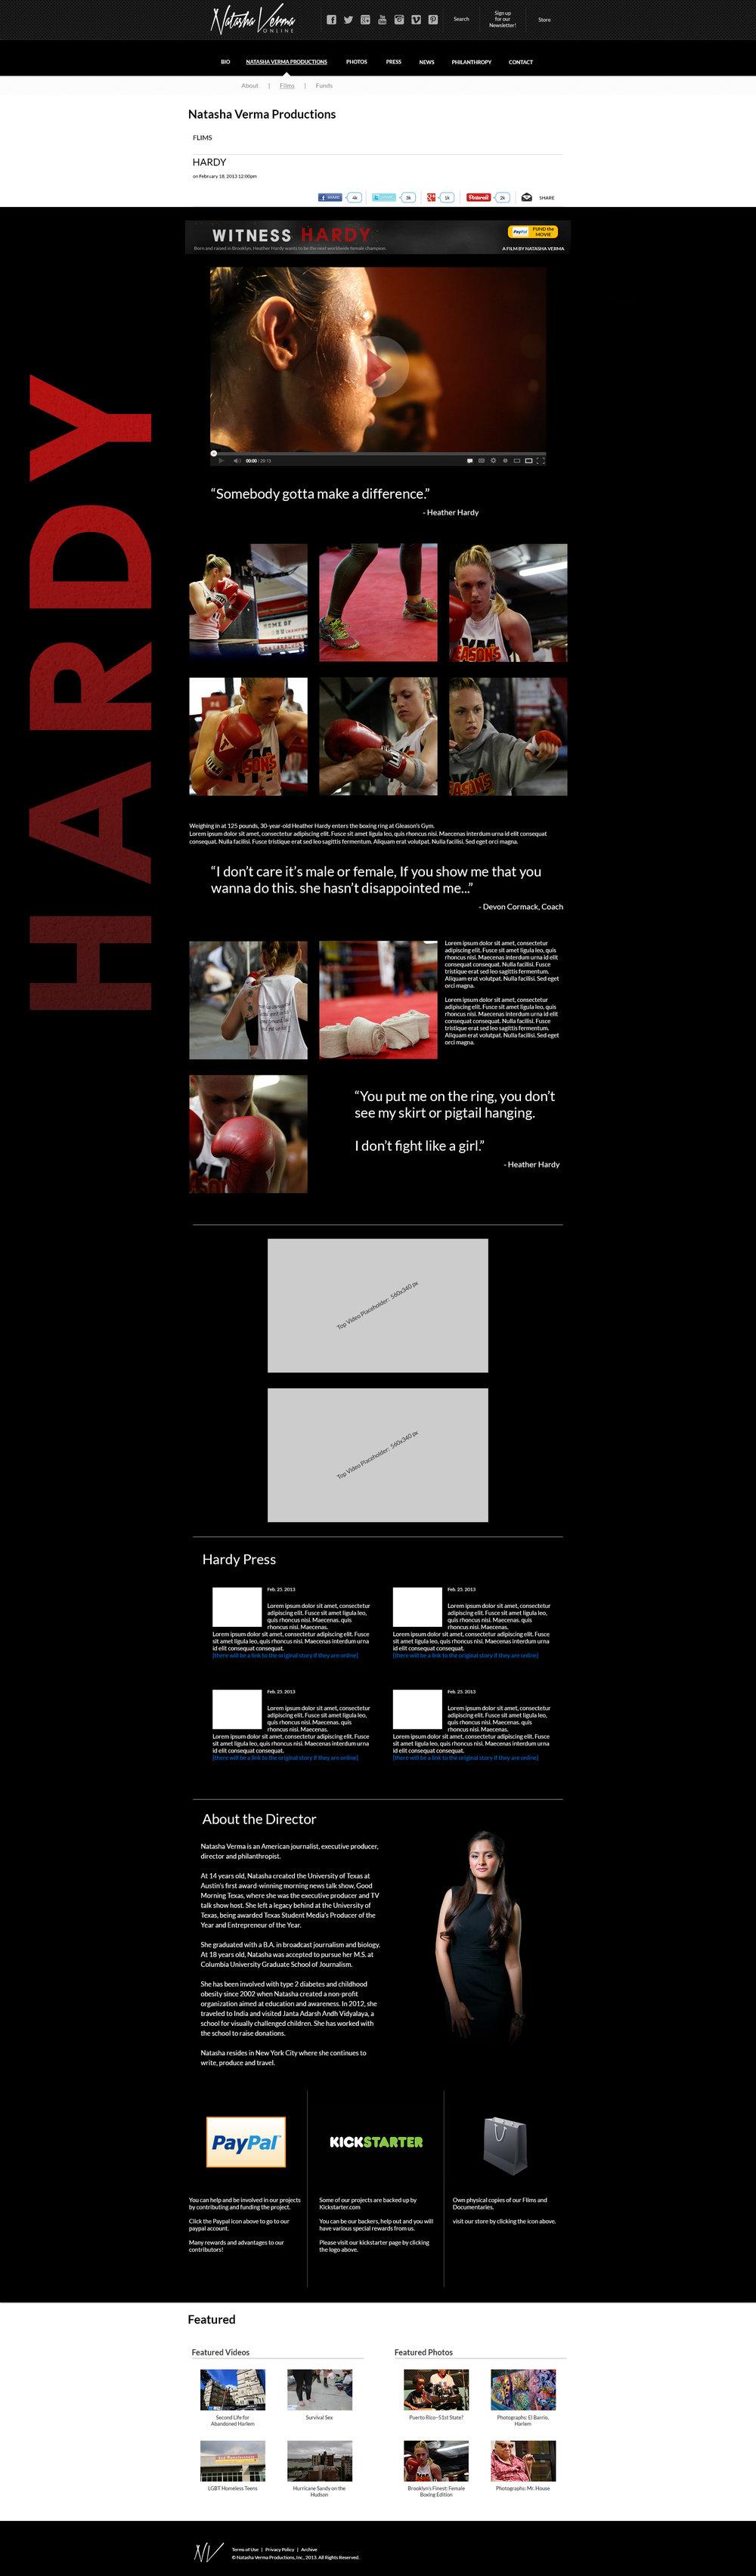 Verma_Subpg_MO-01-NVP-Films-det.jpg